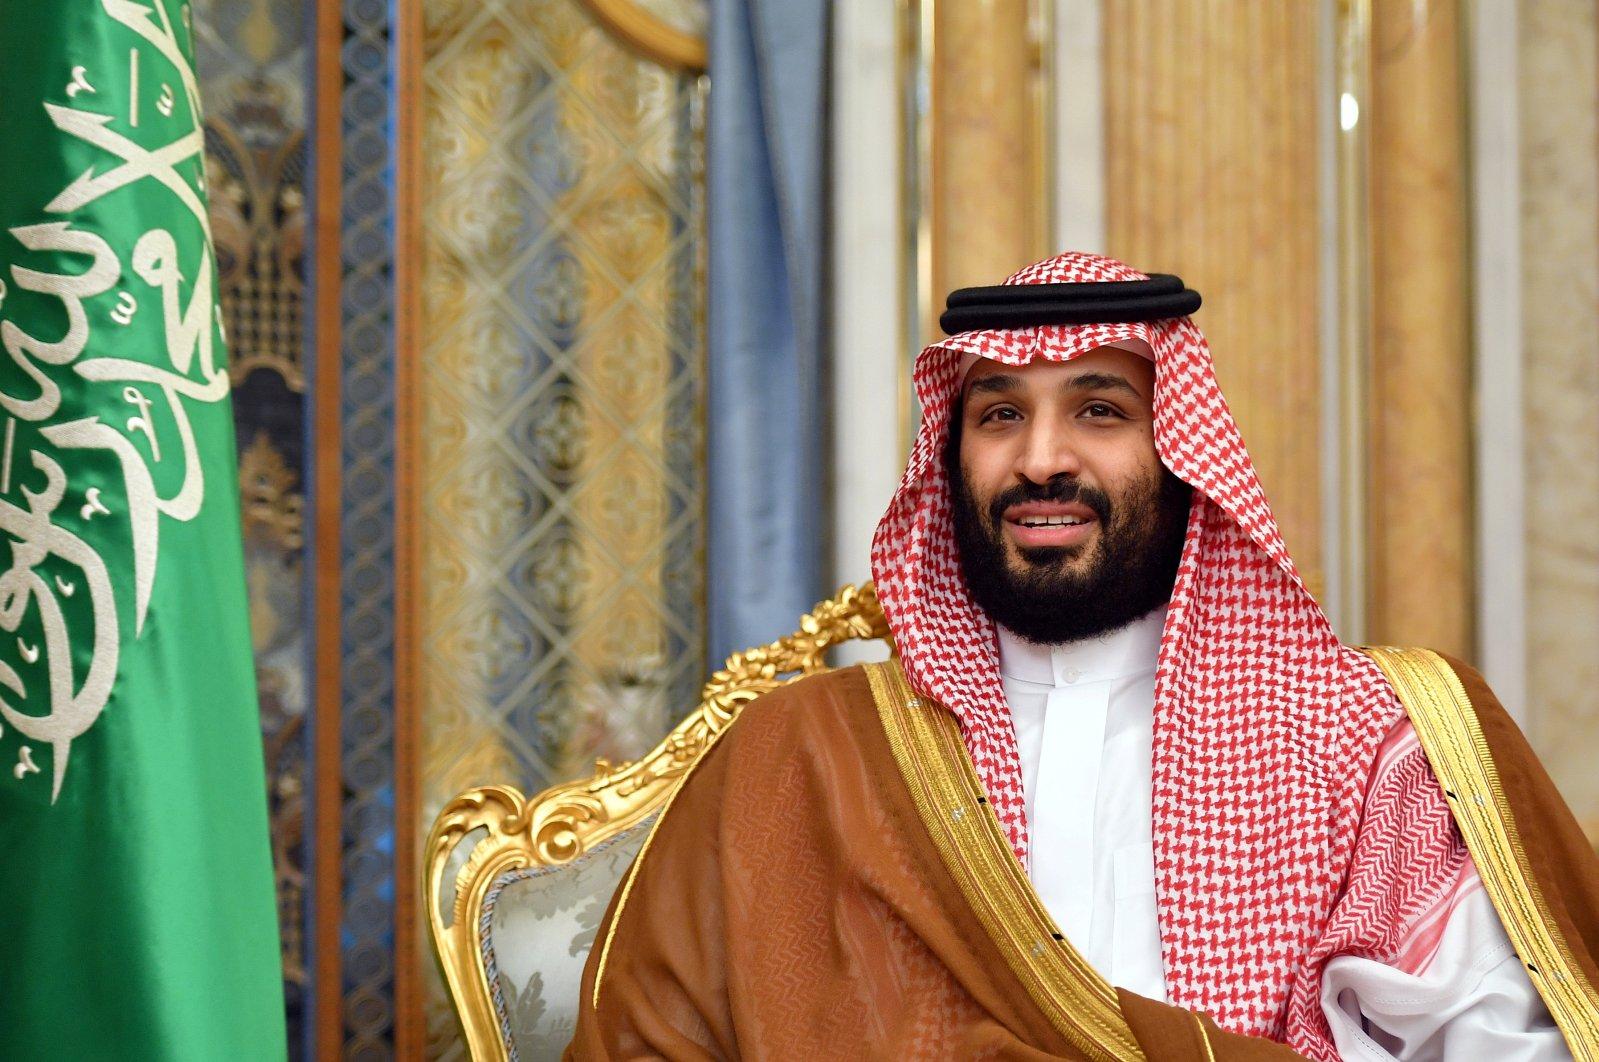 Saudi Arabia's Crown Prince Mohammed bin Salman attends a meeting with U.S. Secretary of State Mike Pompeo in Jeddah, Saudi Arabia, Sept. 18, 2019. (Reuters Photo)